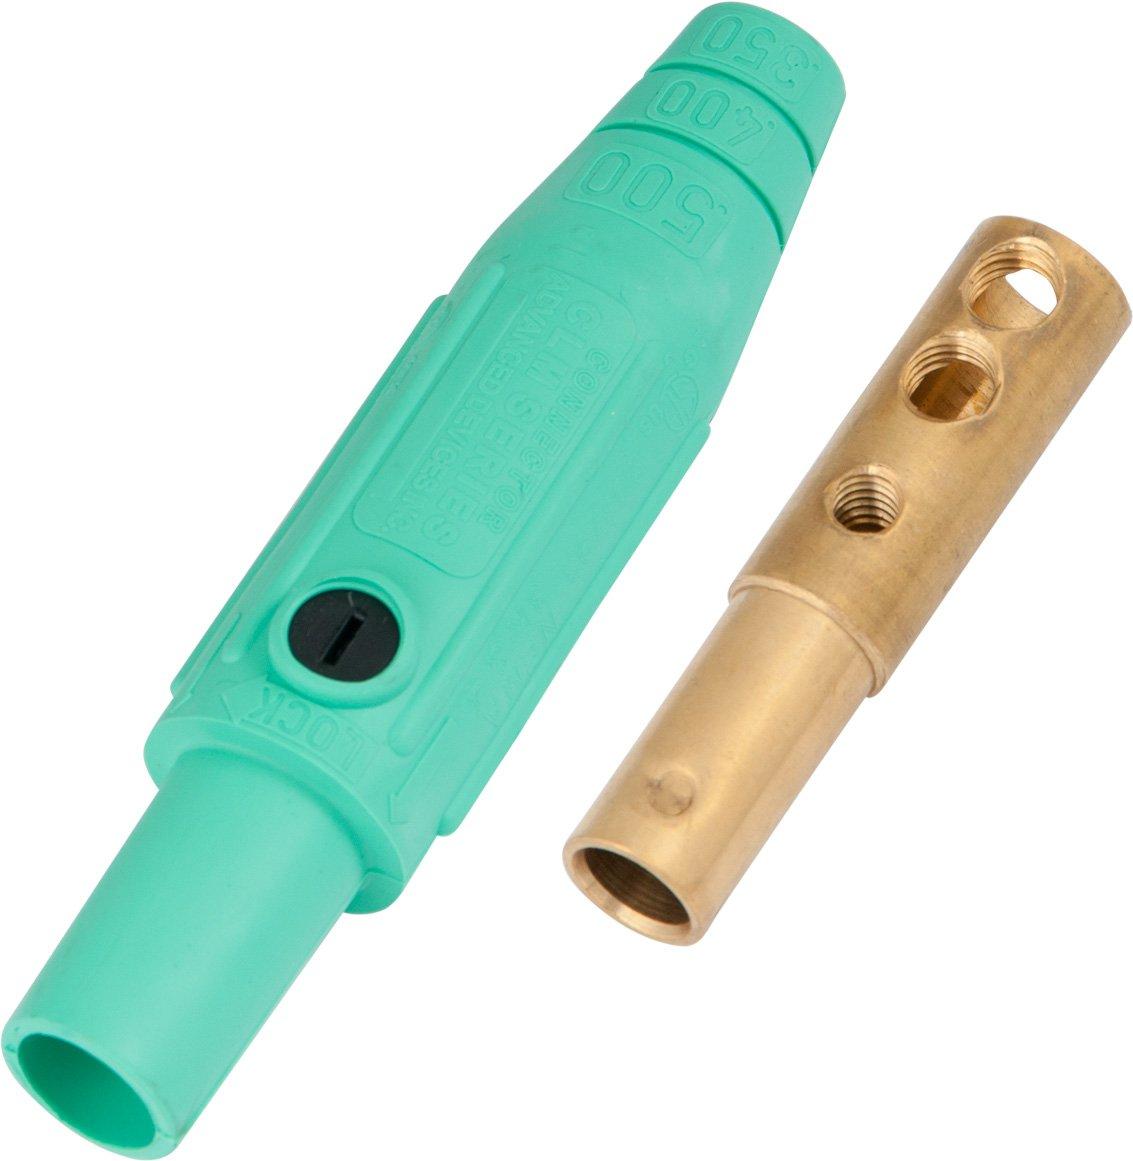 Marinco CLM2F-E CLM Cam Type, Series 15 Mini Inline, Single Pin Connector, 150 Amp, 600 Volt, #8 - #2 AWG, Female - Green (E)